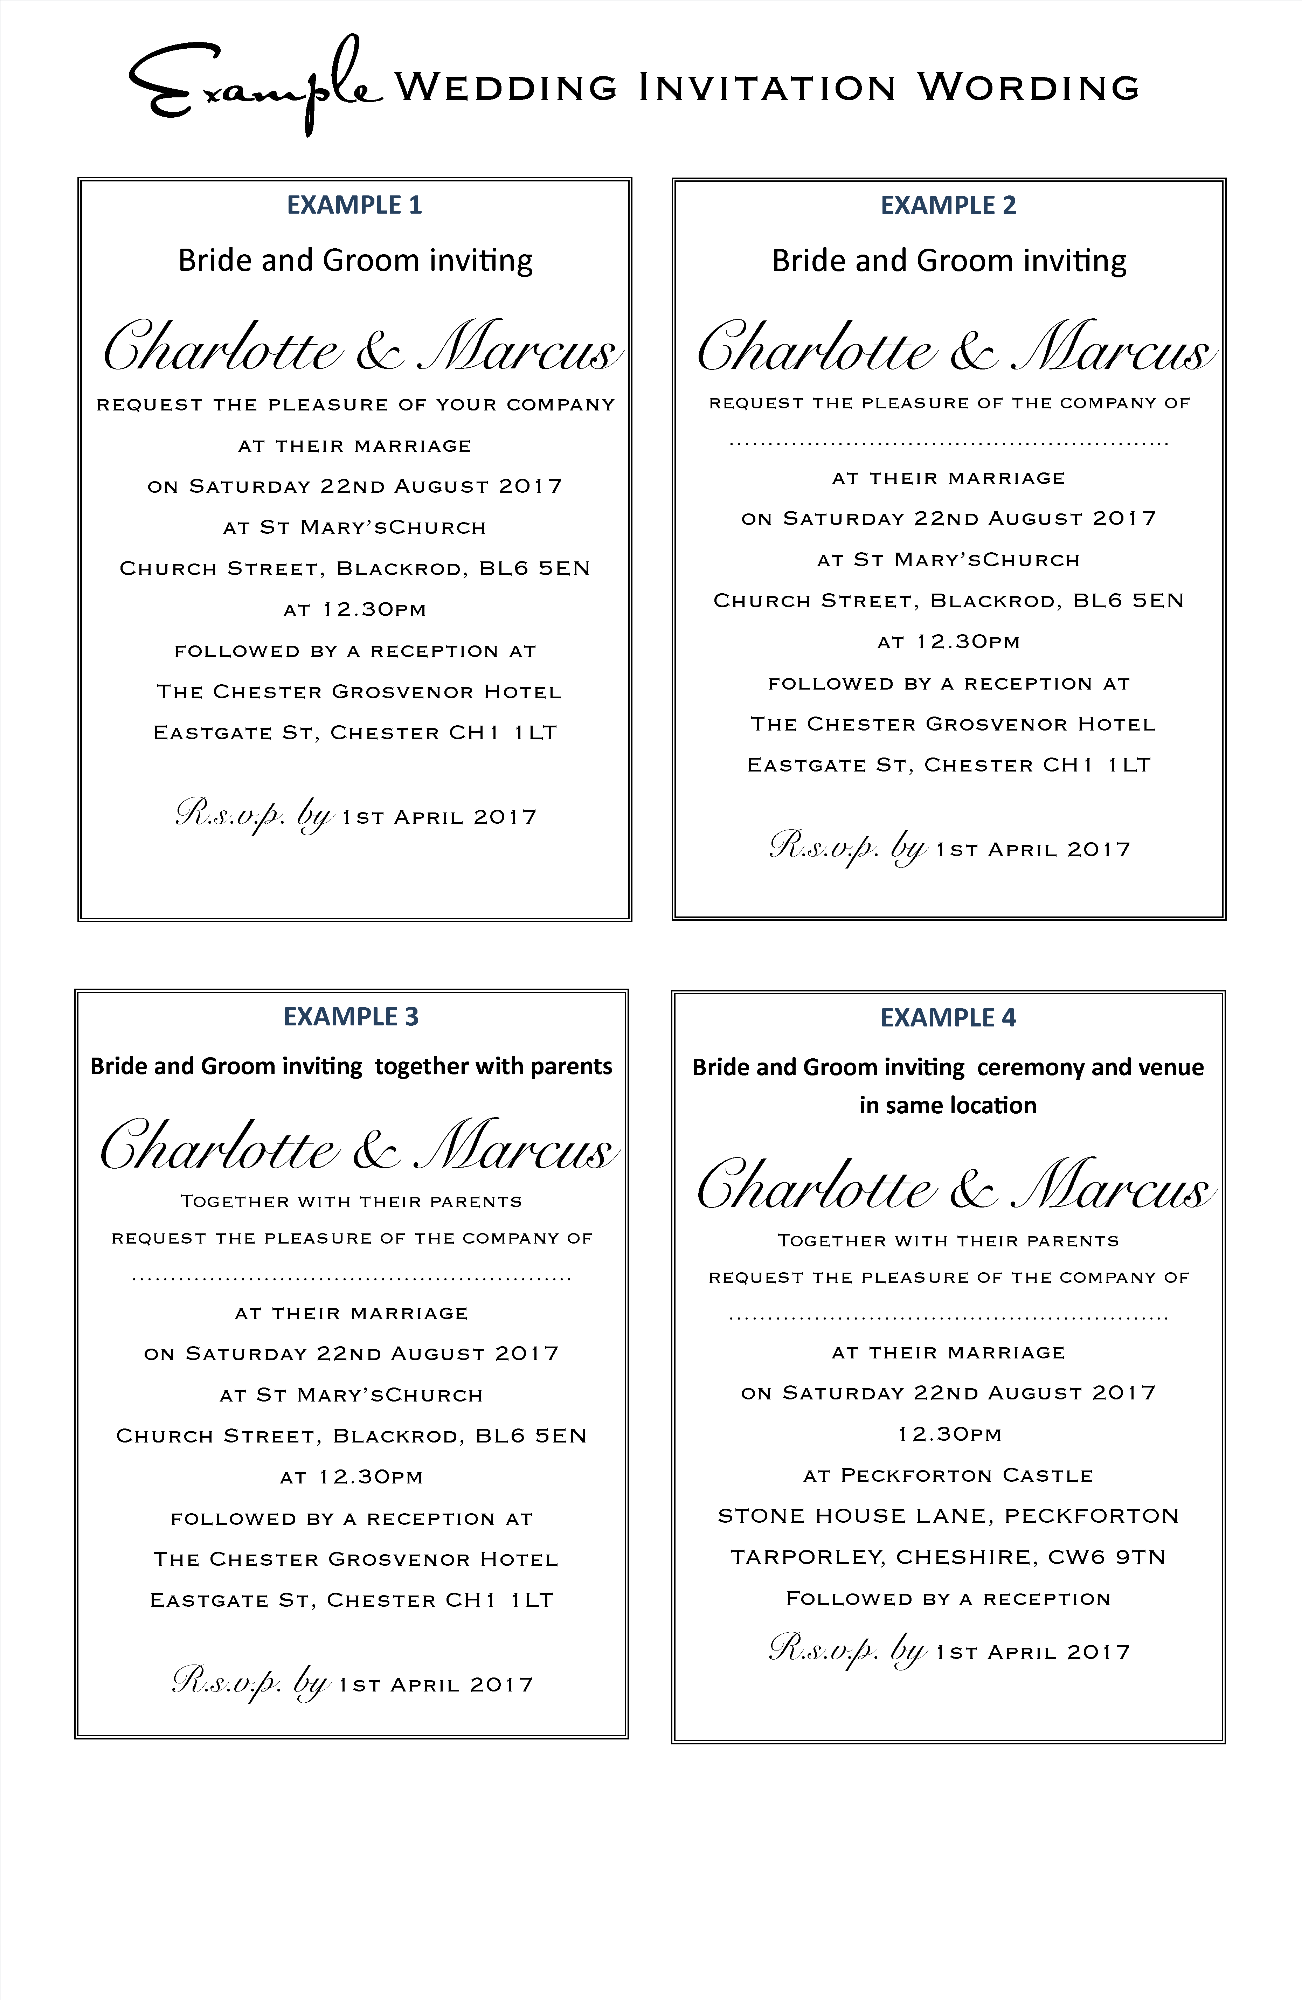 Wedding Invitation Wording Examples Amor Designs